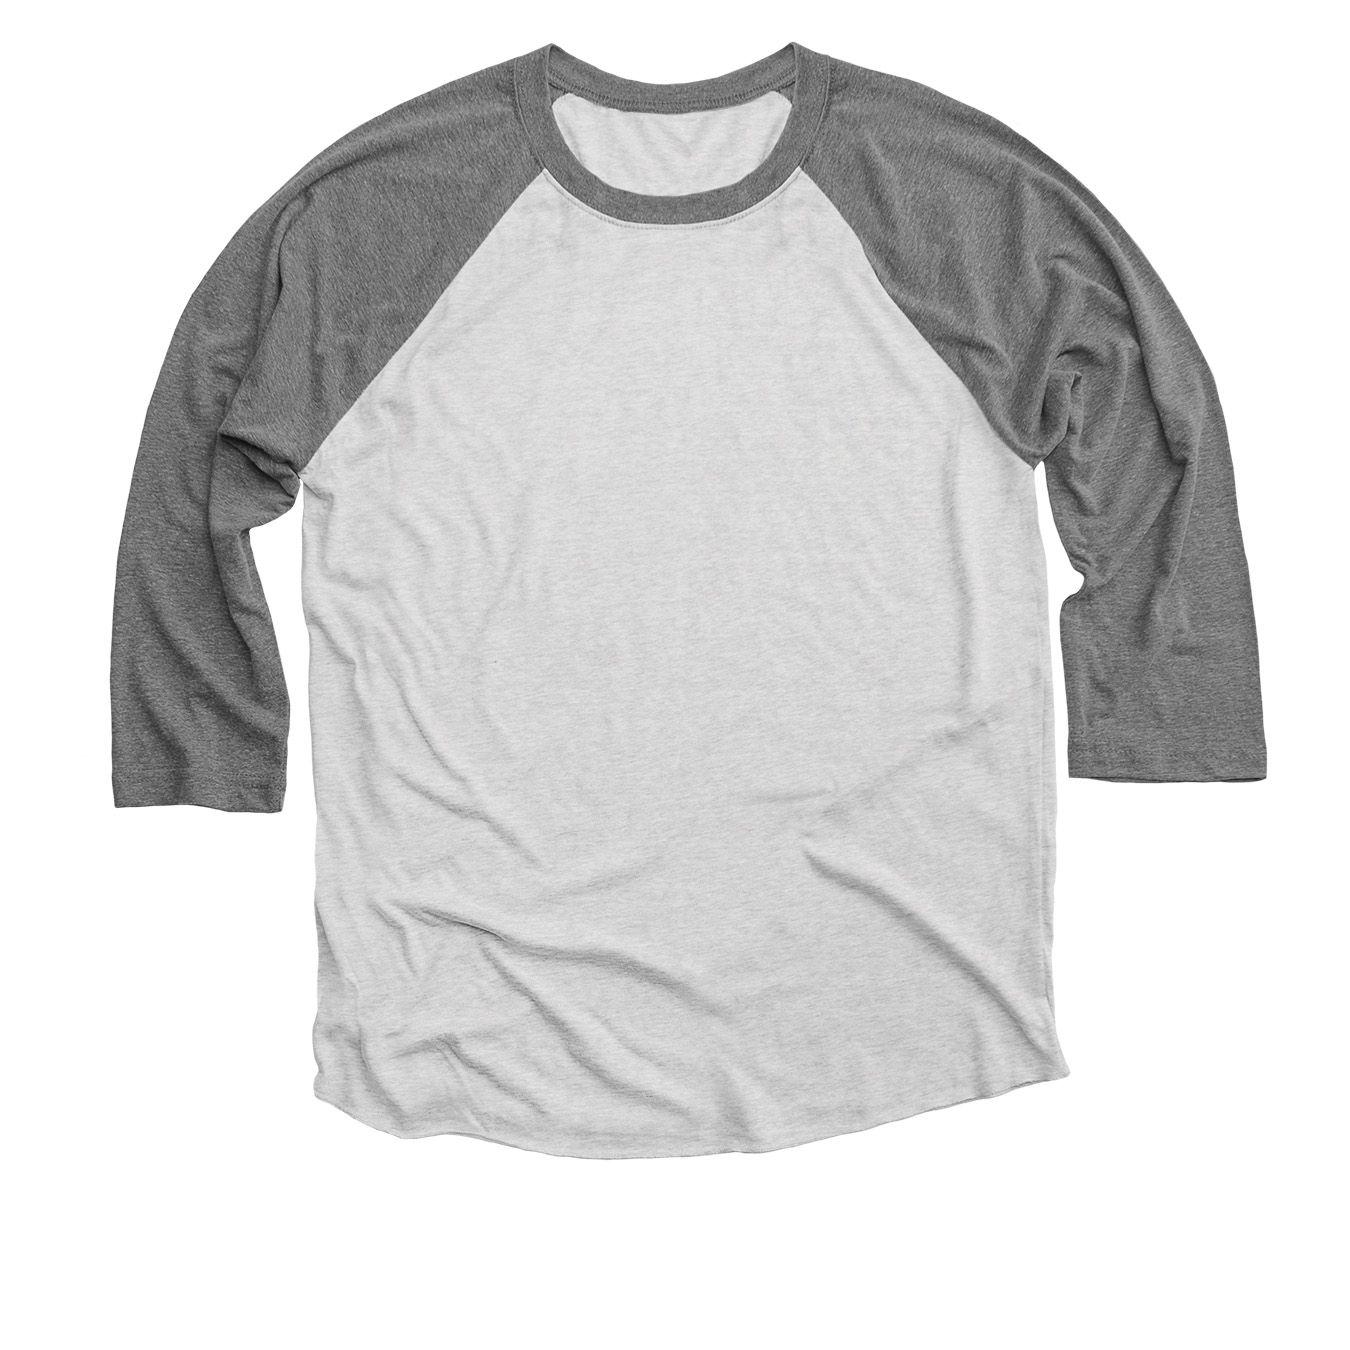 T Shirt Design Tool Make Your Own Shirt Design Bonfire Make Your Own Shirt Design Your Own Shirt Custom Shirts